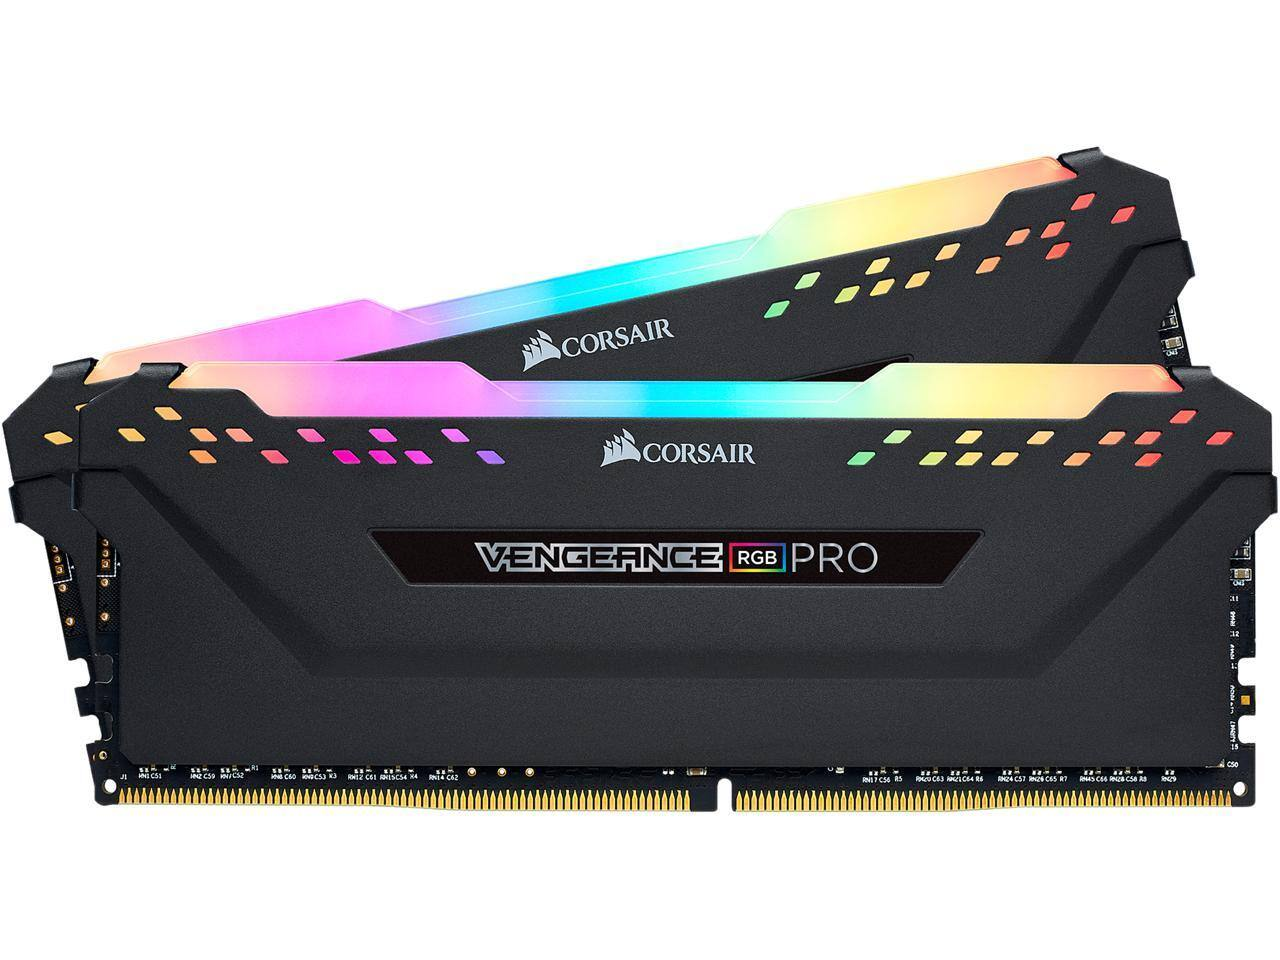 CORSAIR Vengeance RGB Pro 16GB (2 x 8GB) 288-Pin DDR4 DRAM DDR4 3000 (PC4 24000) Desktop Memory Model CMW16GX4M2C3000C15 $79.99